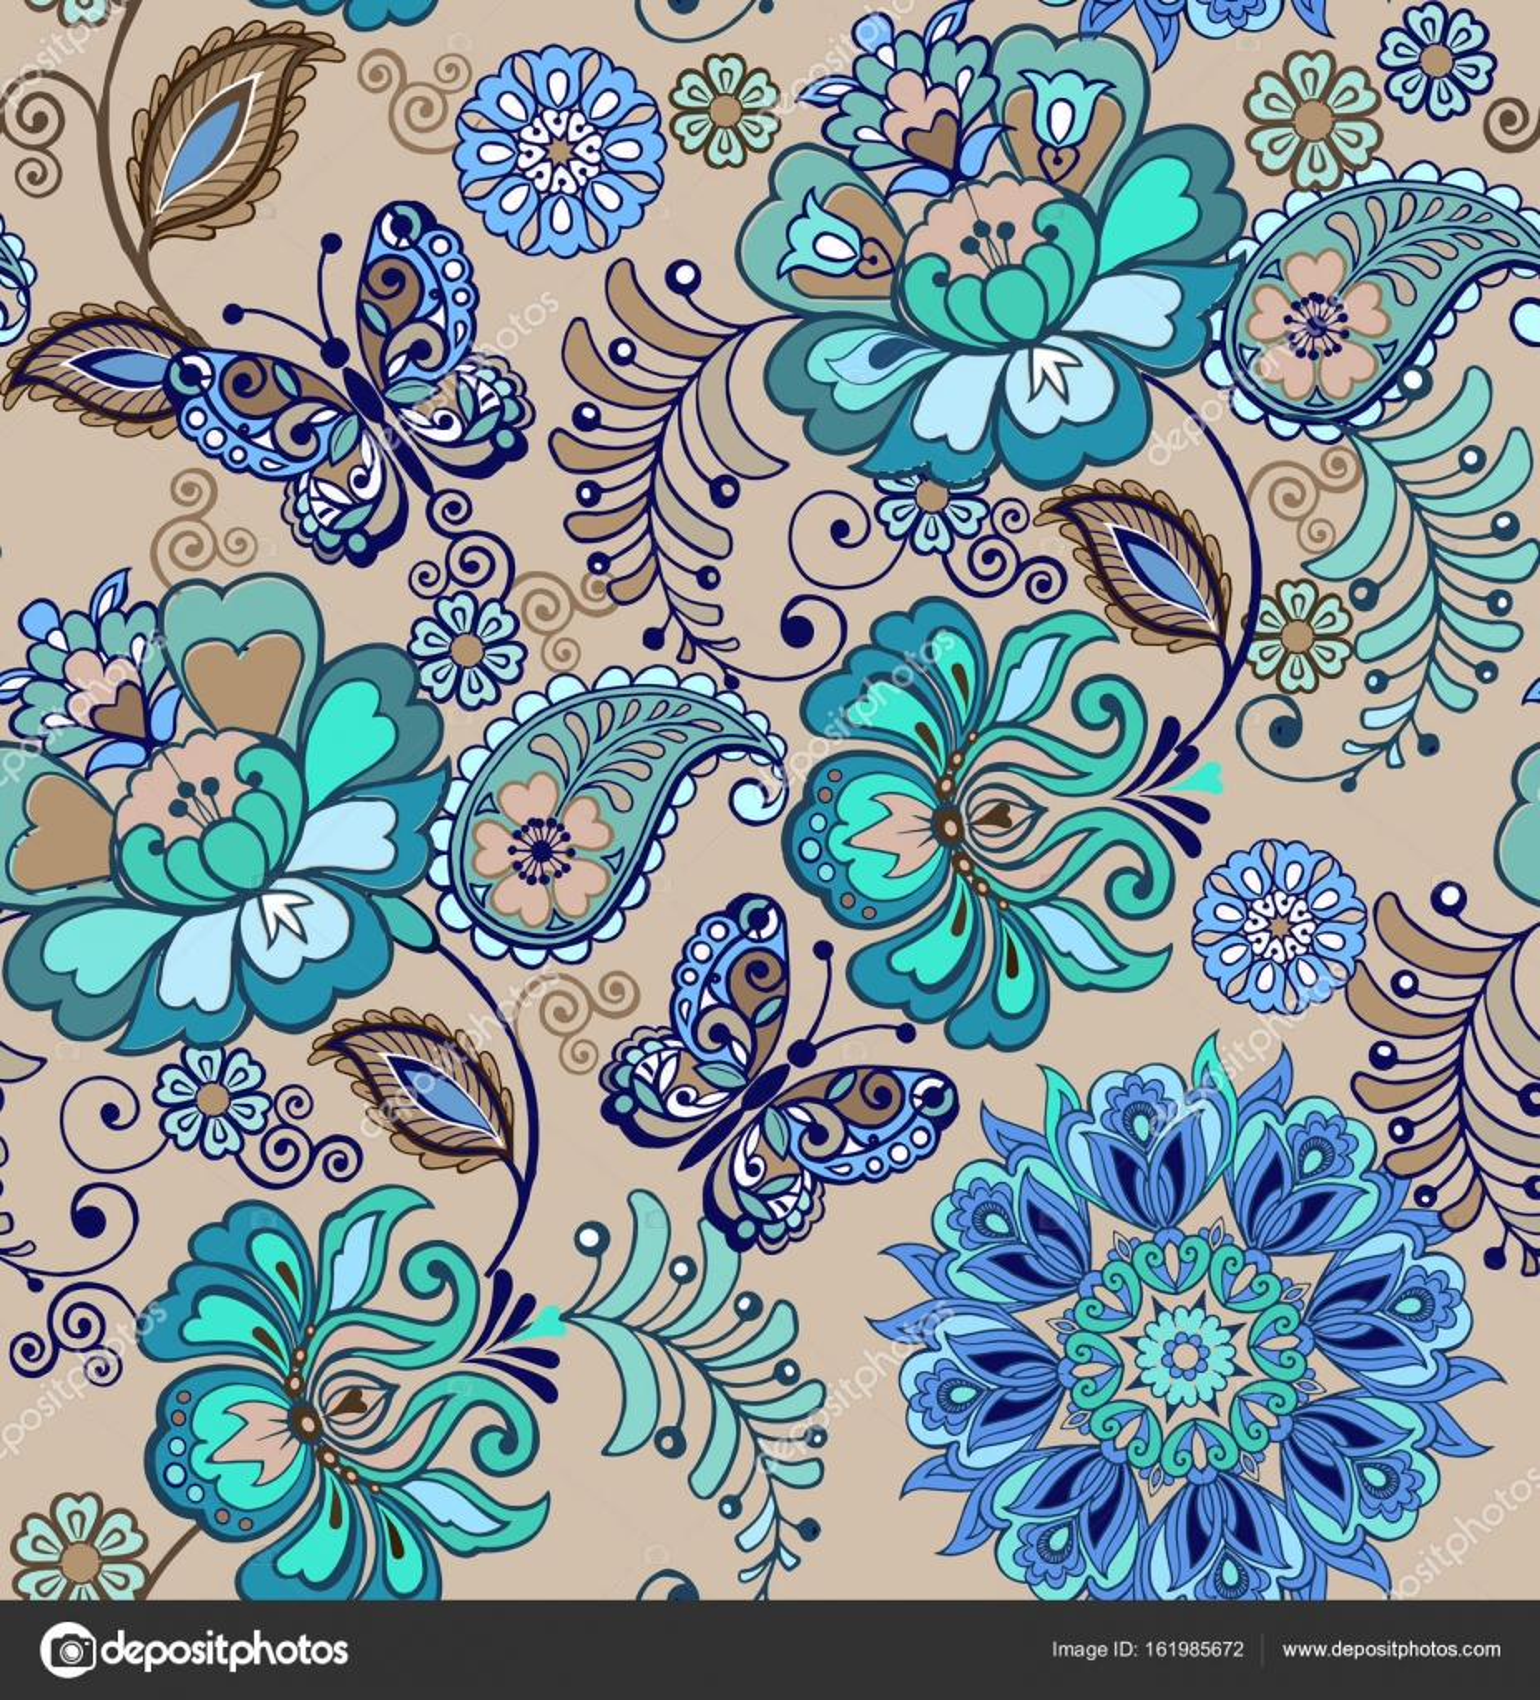 Fondo flores vintage azules fant stico ornamento floral - Fotos decorativas ...